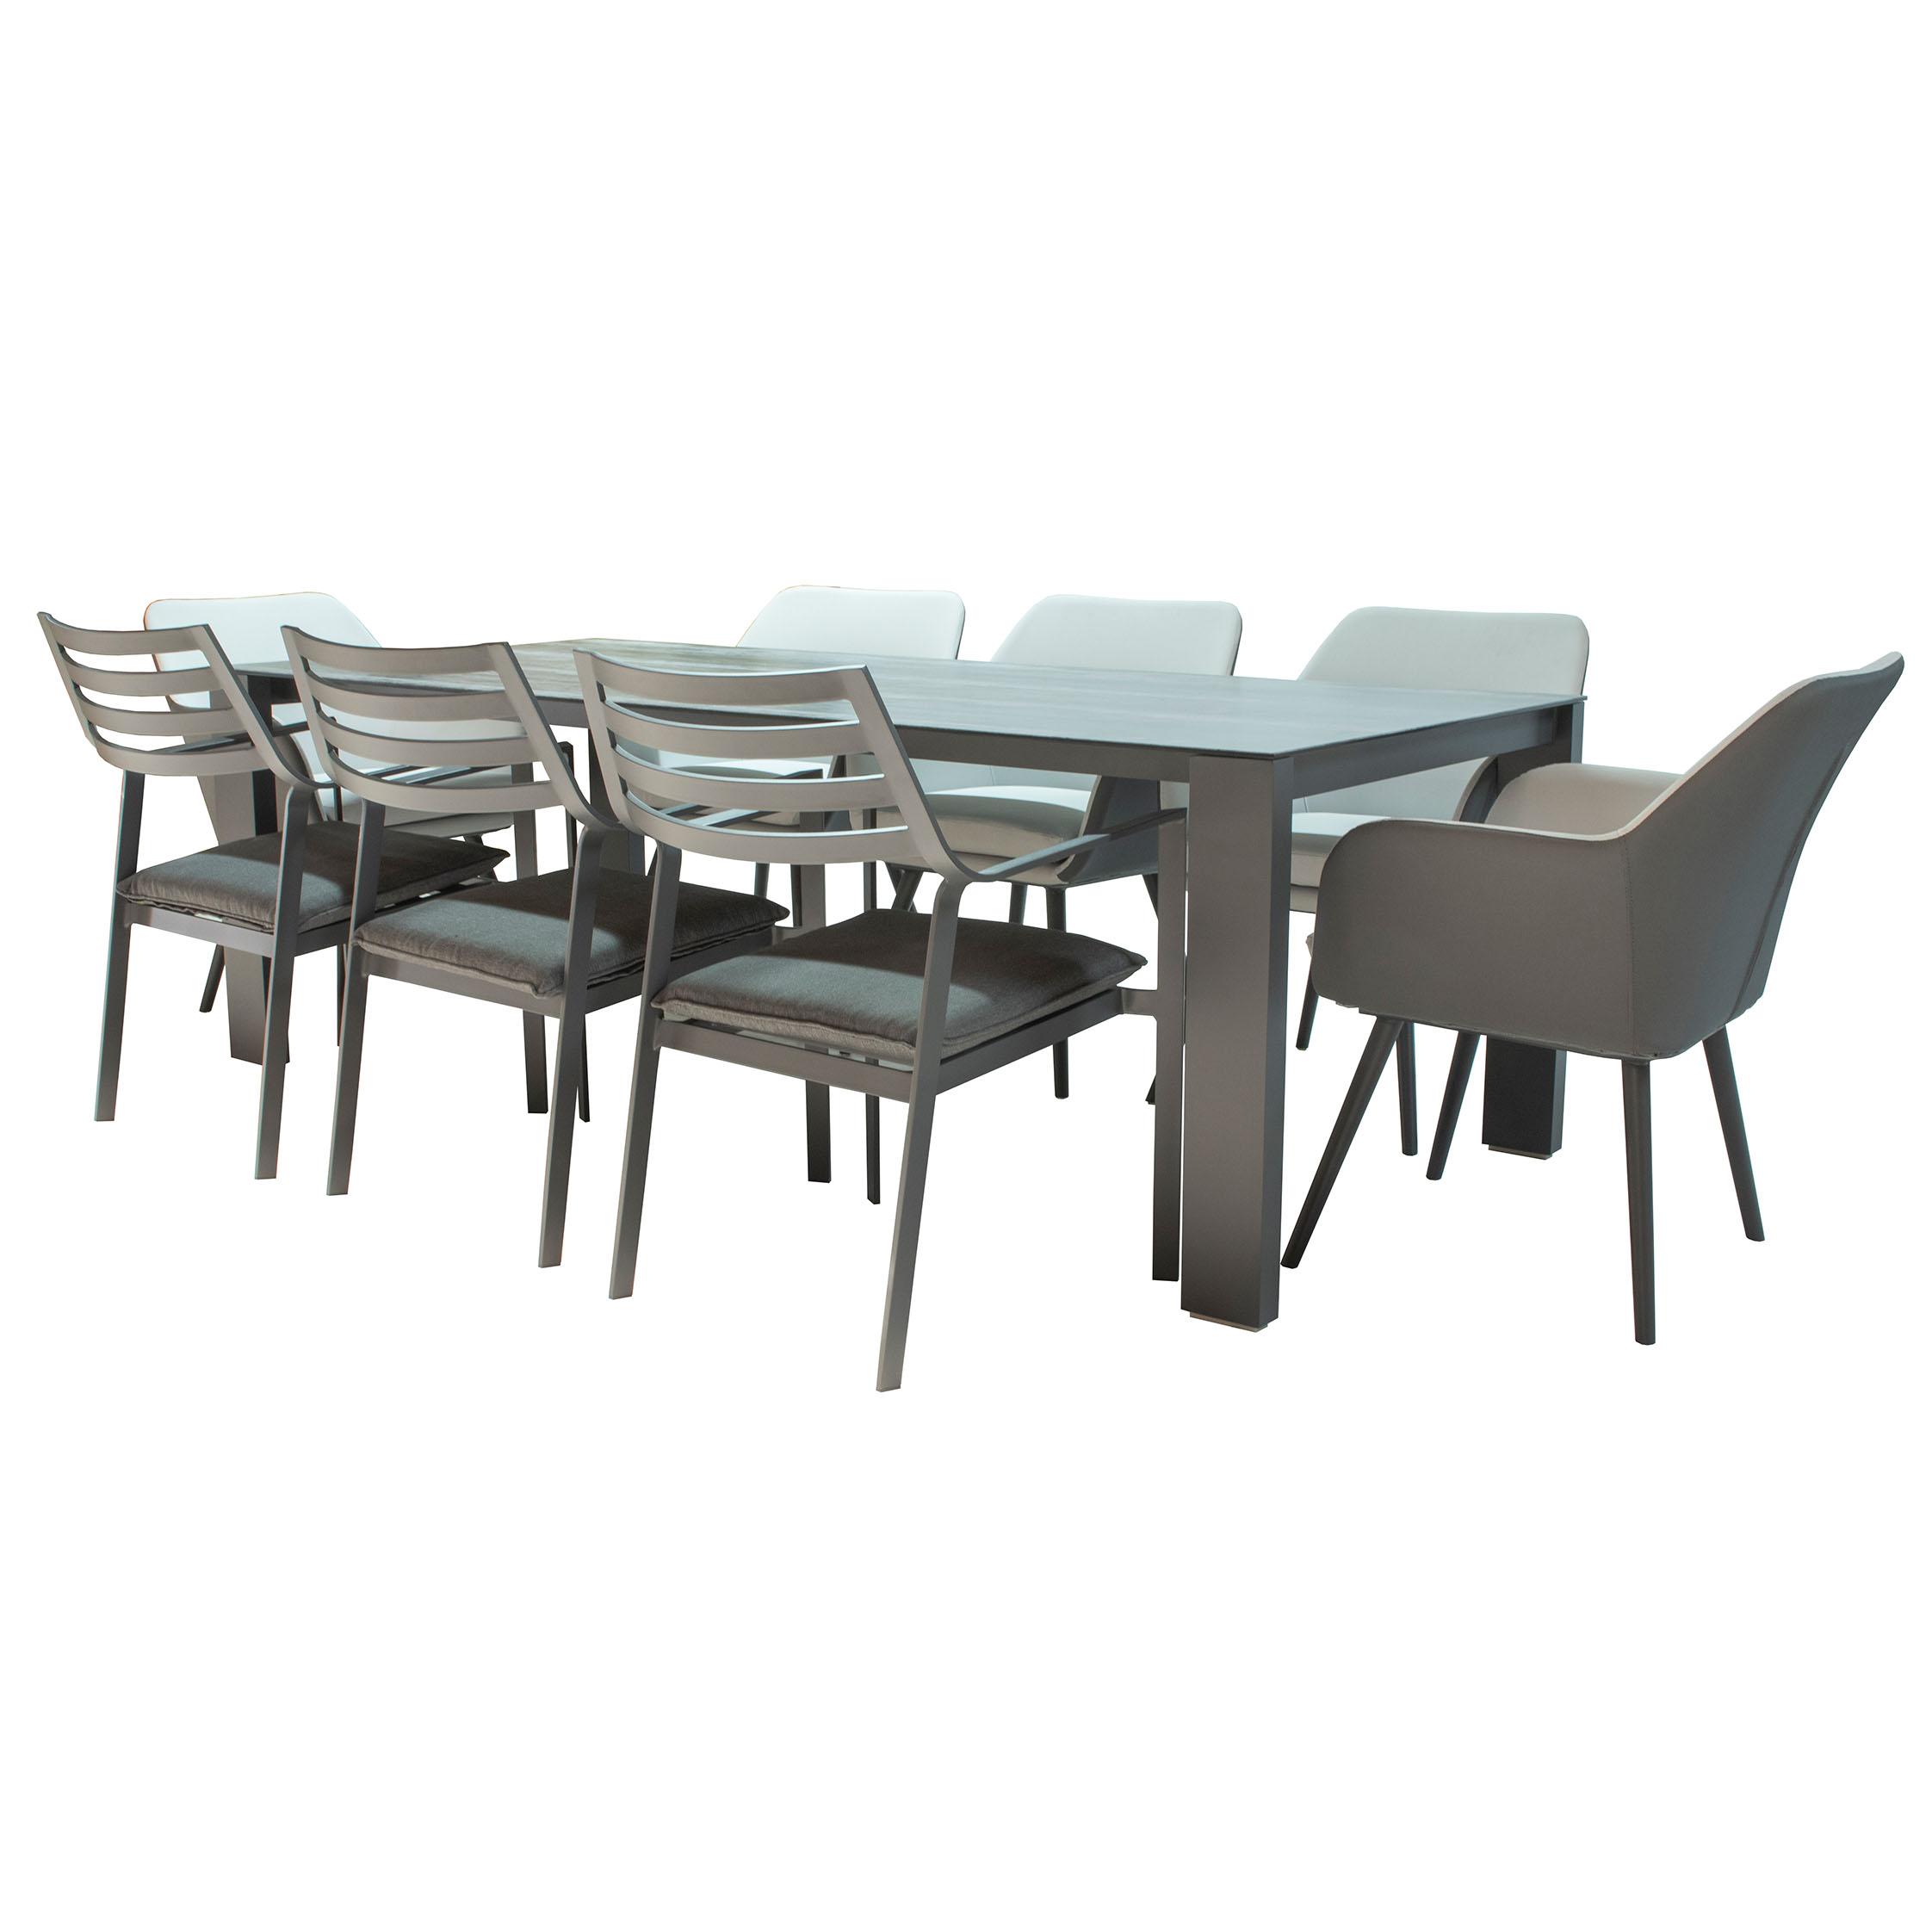 Sparta 8 seater Dining set